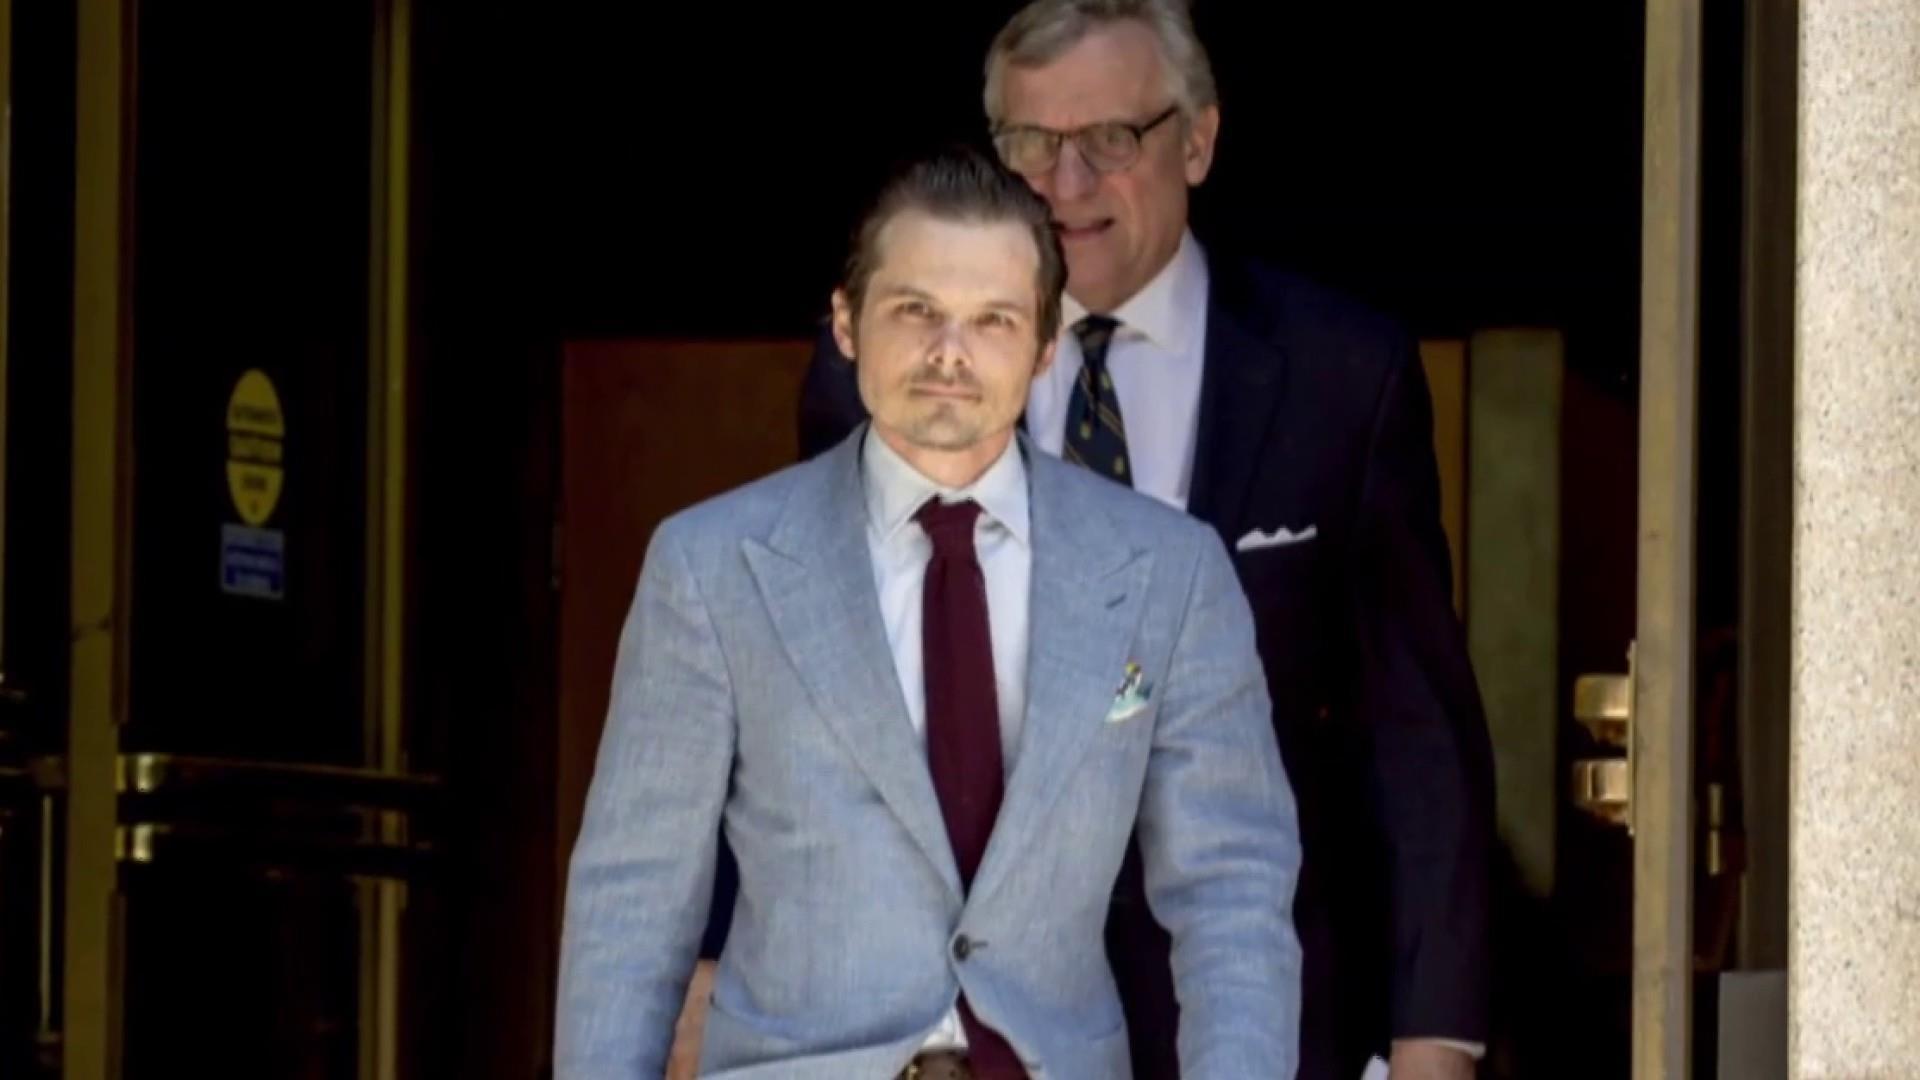 'Wingman' to witness: Roger Stone aide flips